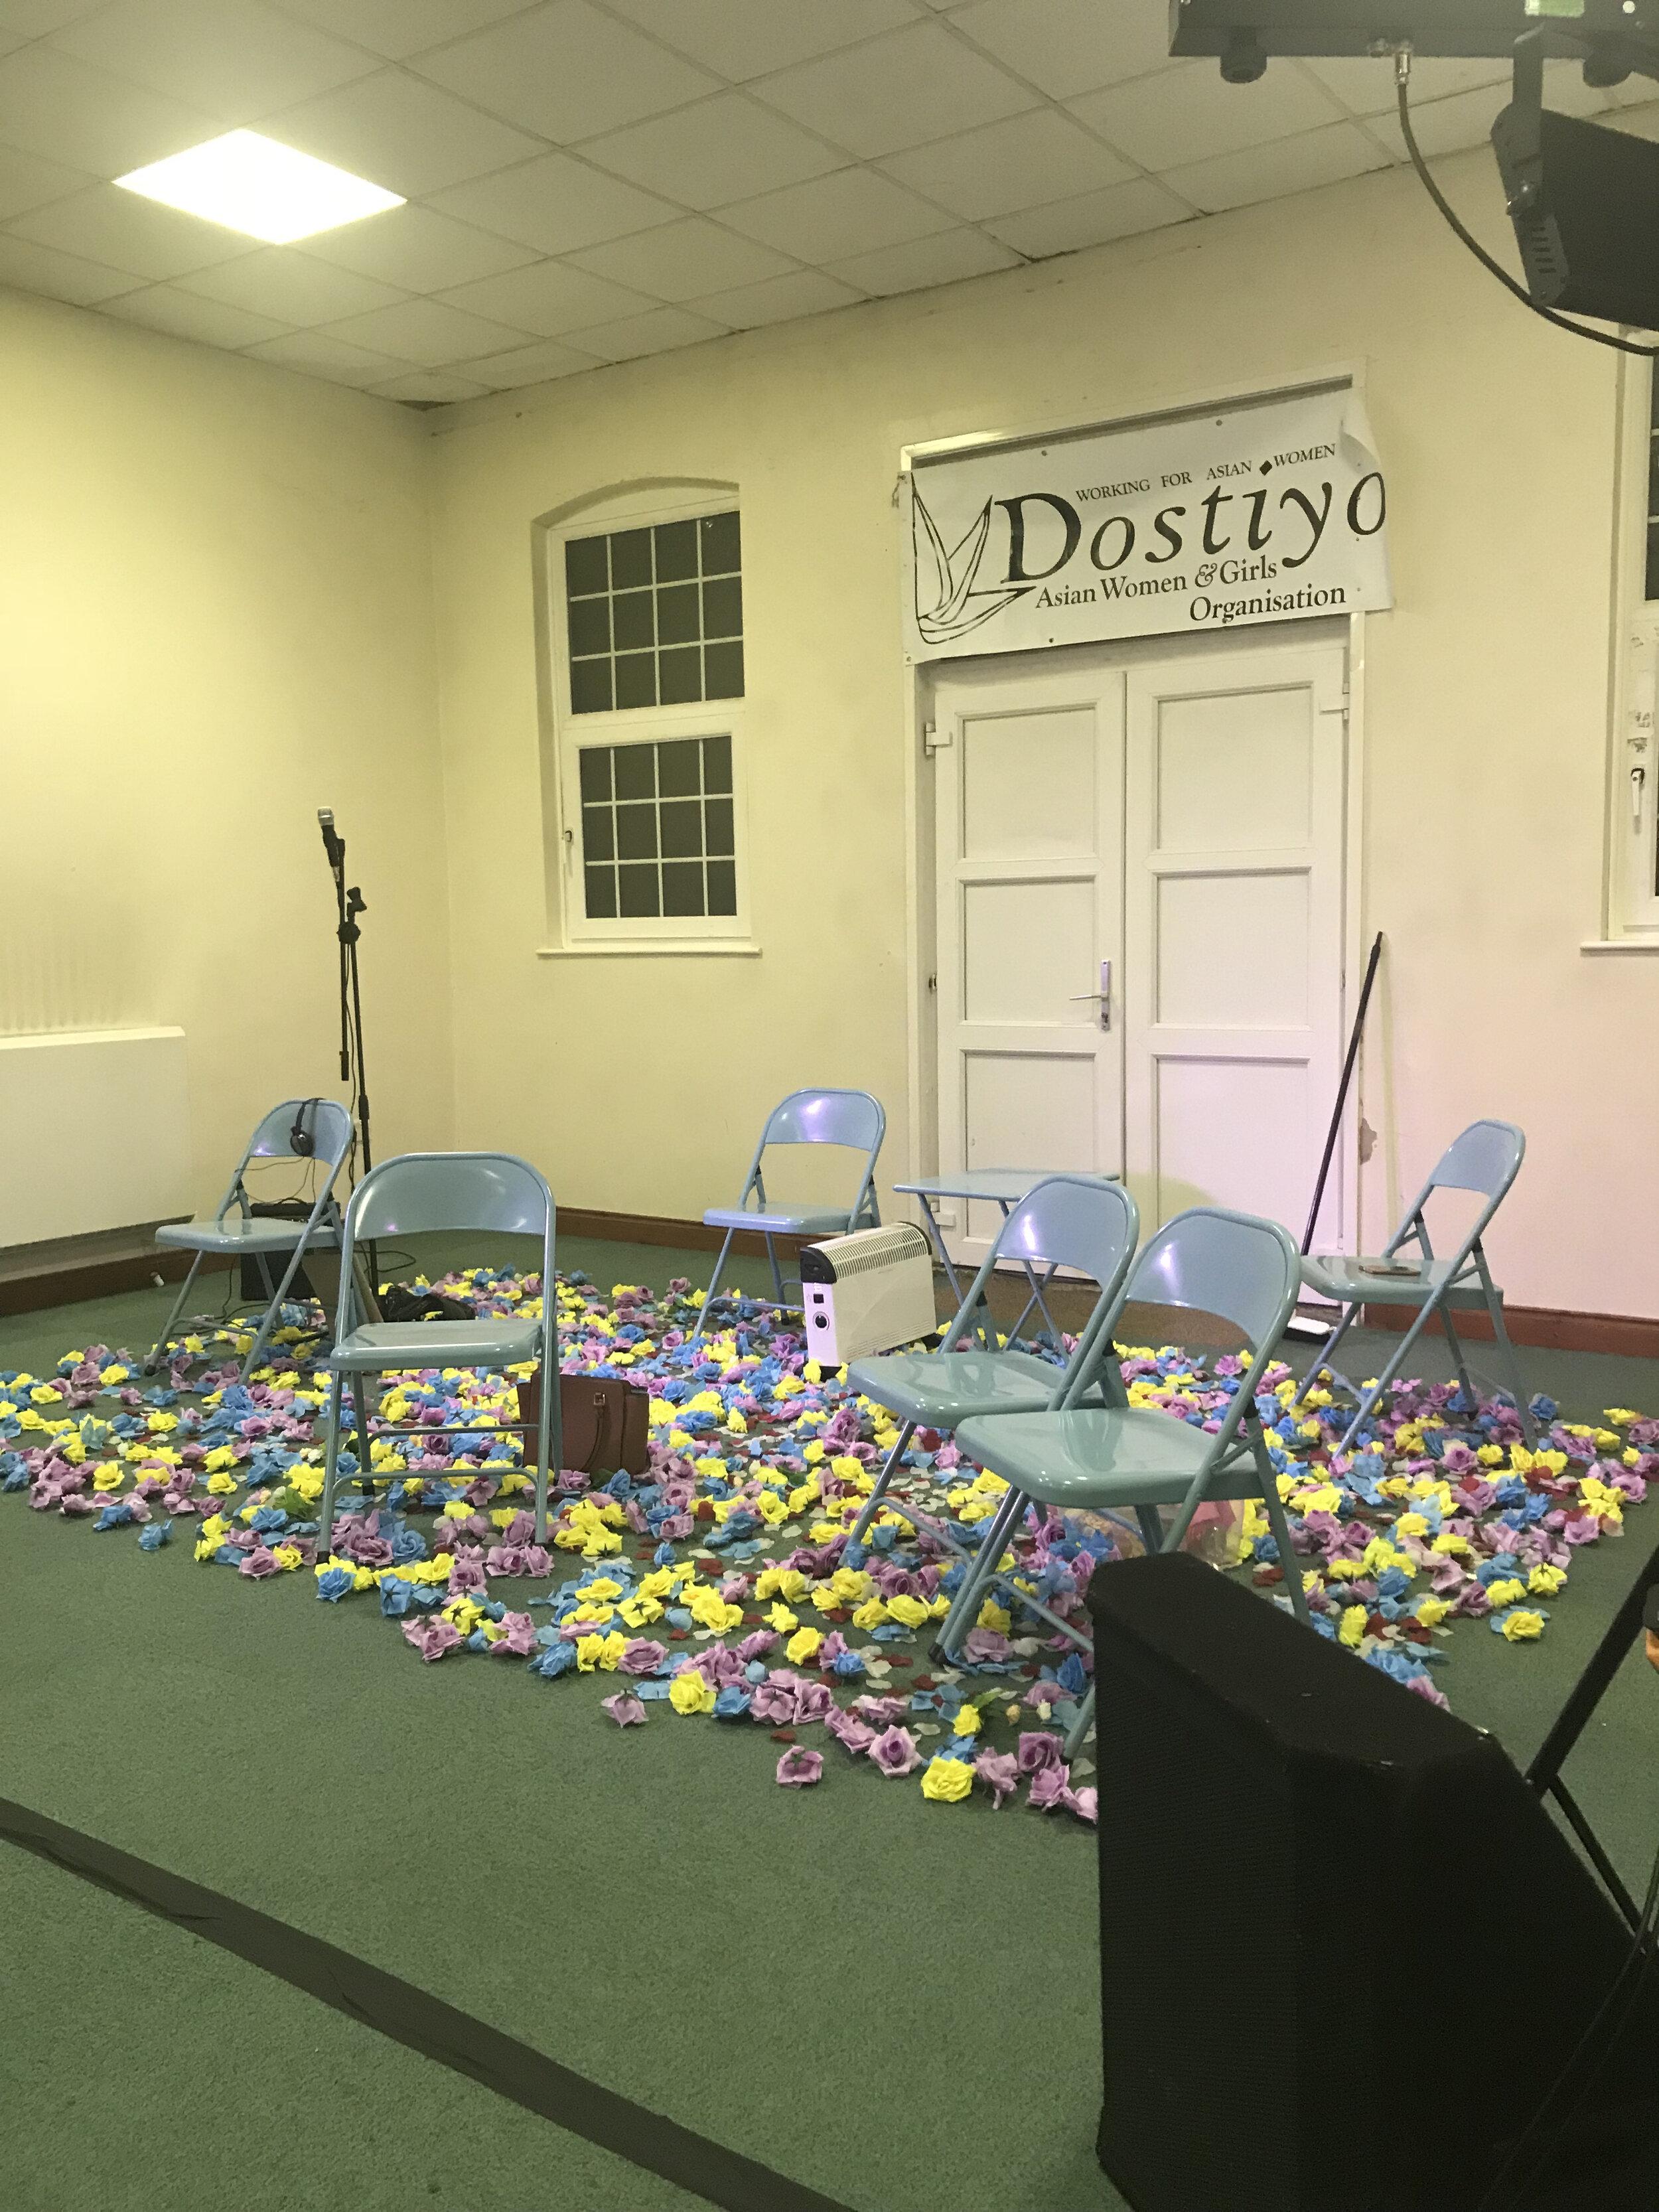 Stage set for Divided at Dostiyo.jpg